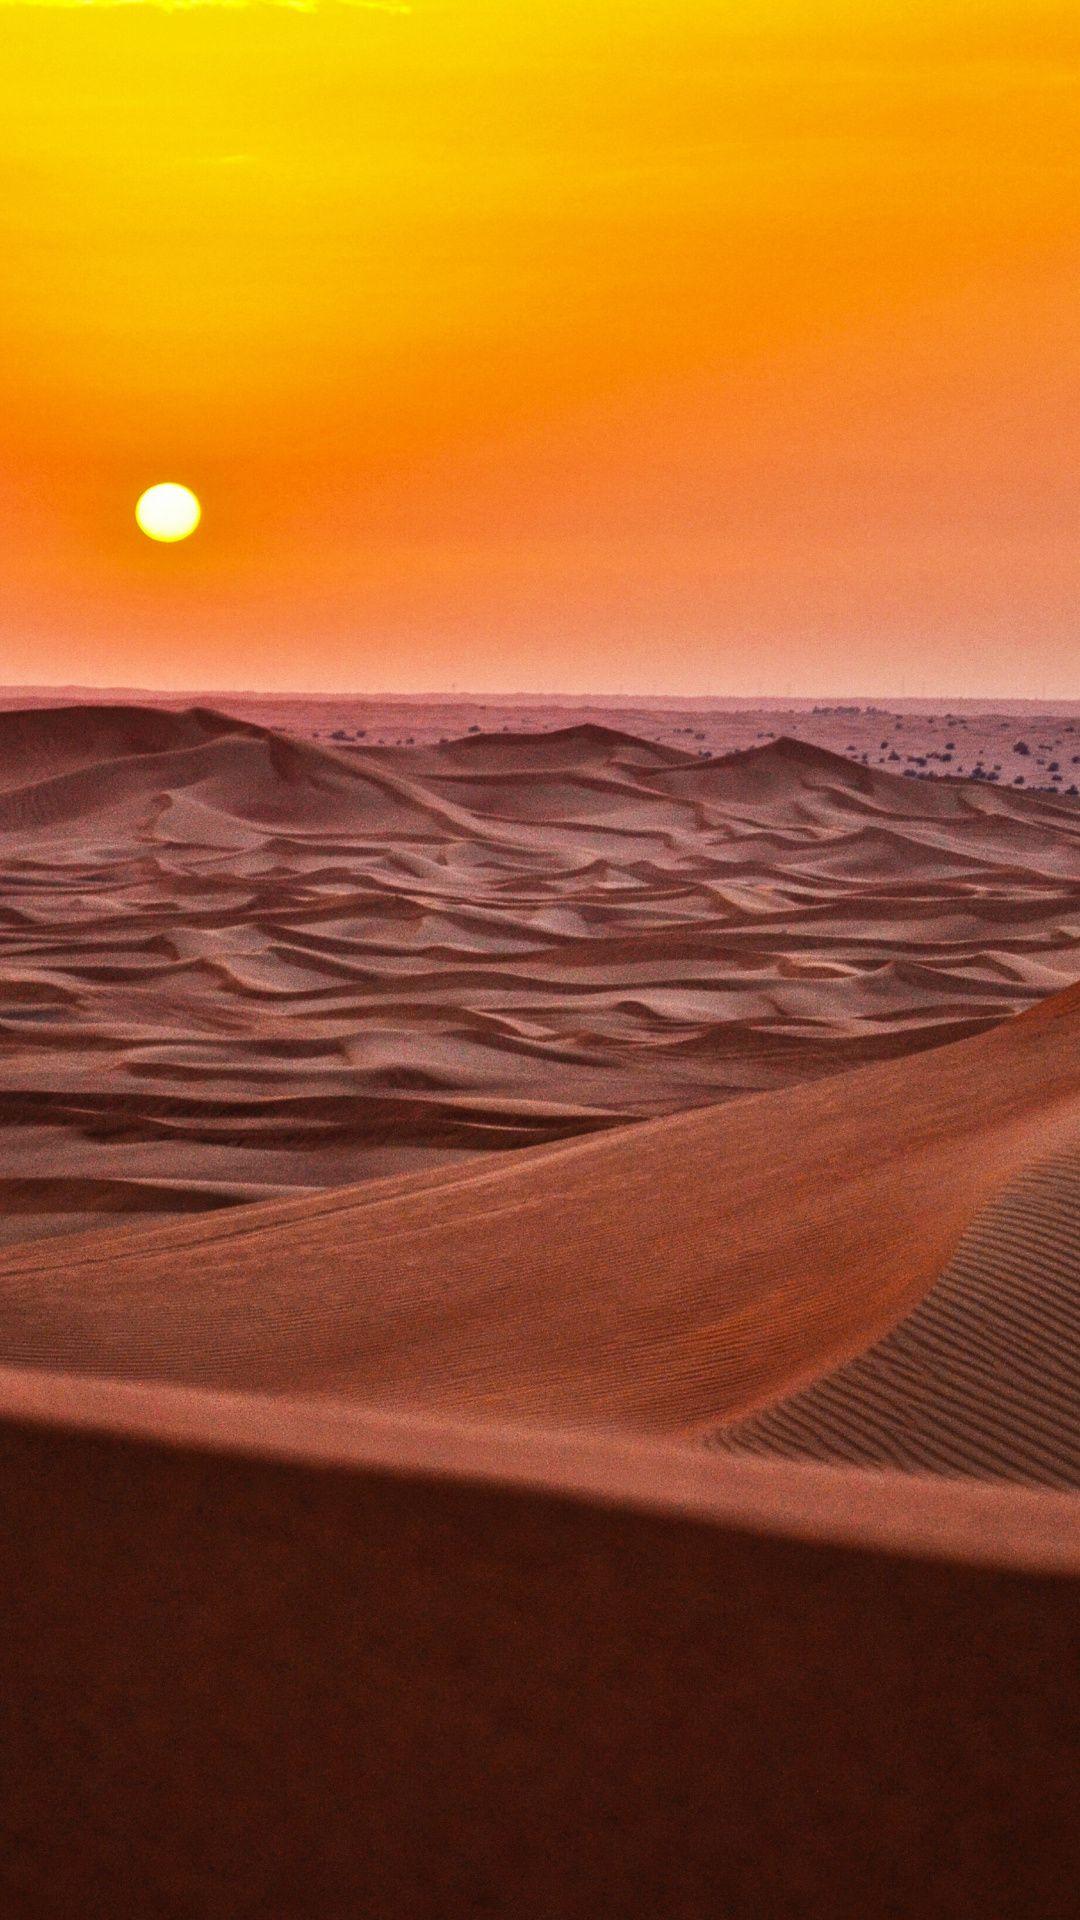 Sunset, desert, landscape, dunes wallpaper Wallpaper